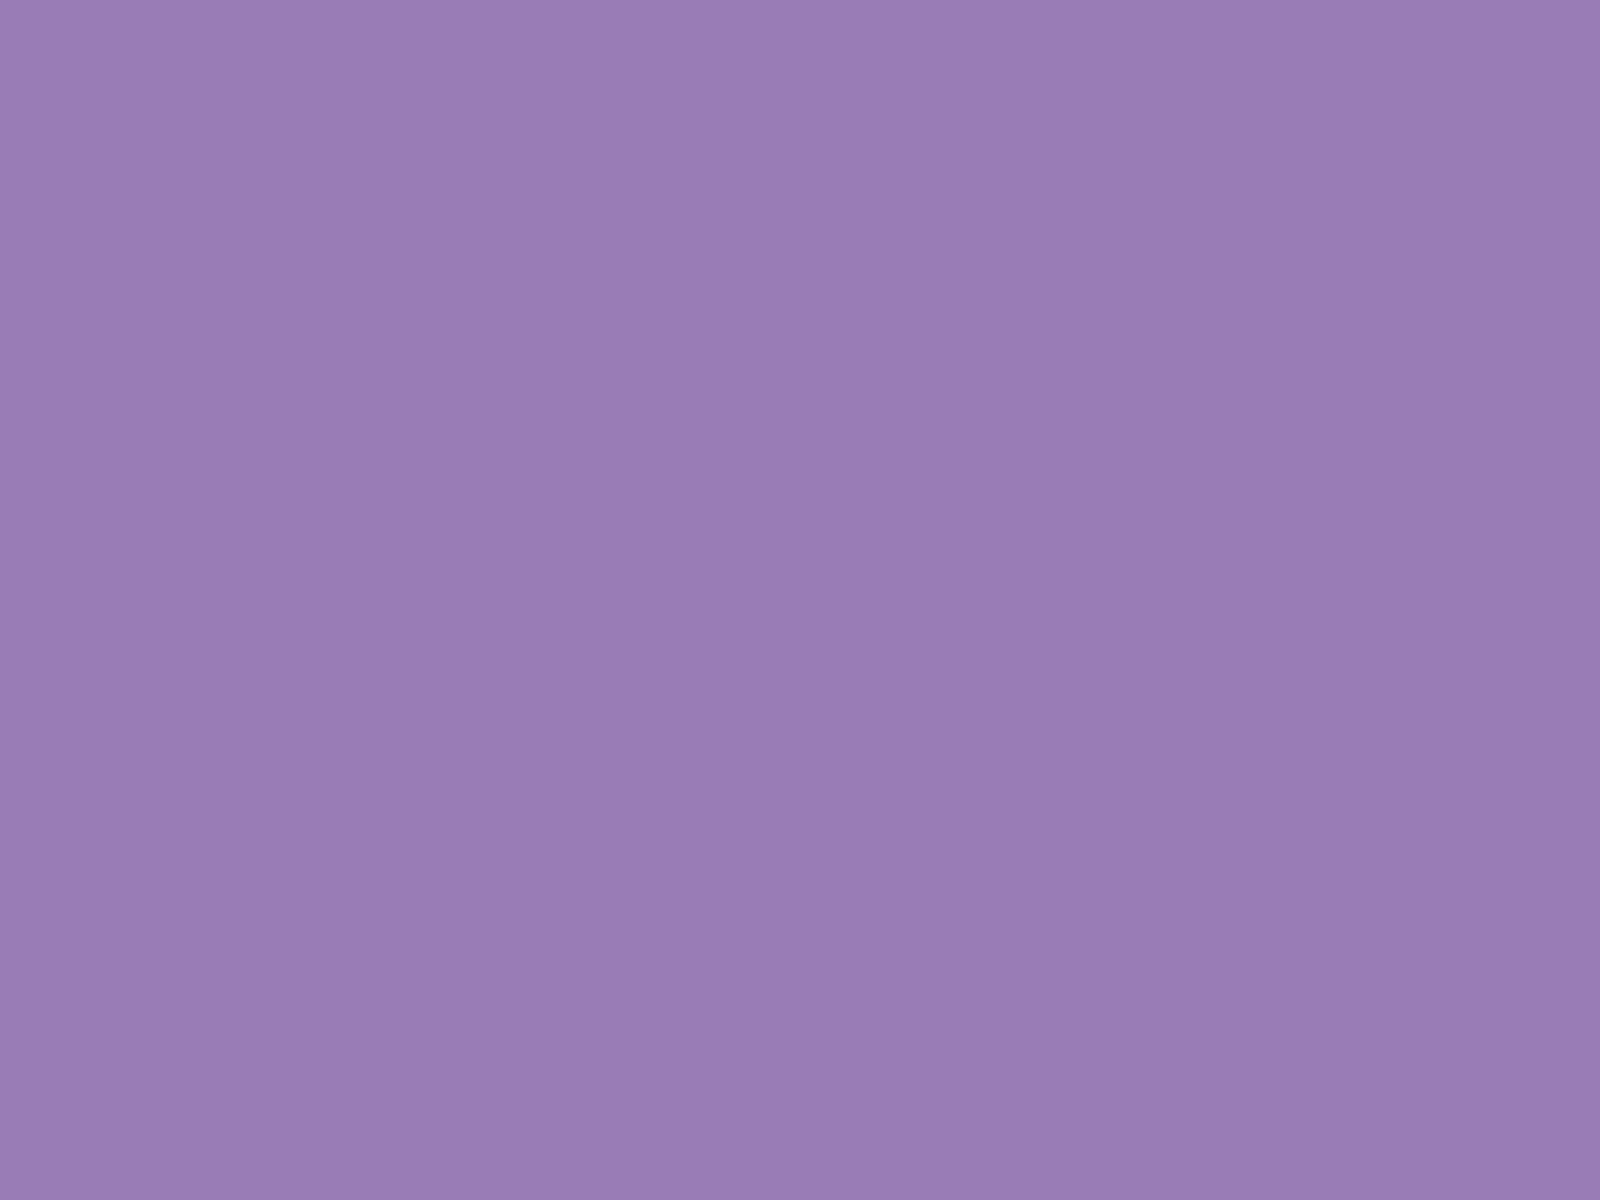 1600x1200 Lavender Purple Solid Color Background